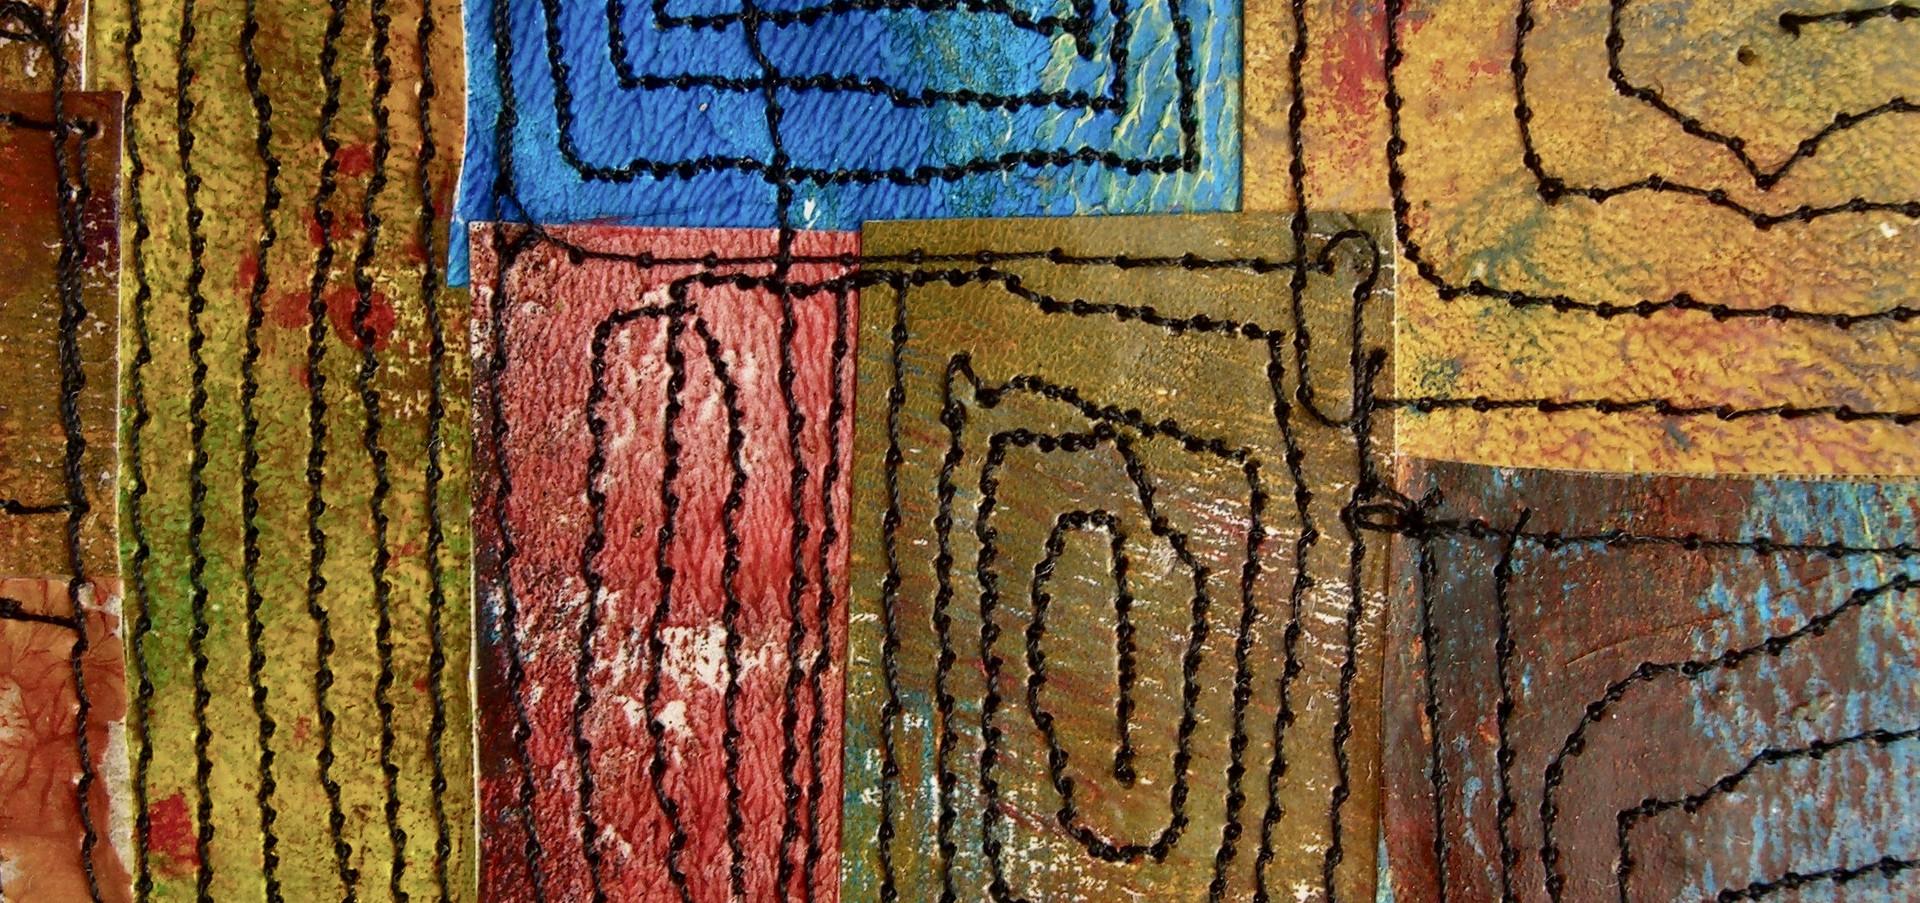 Painted Paper Quilt #4 (Detail 1)